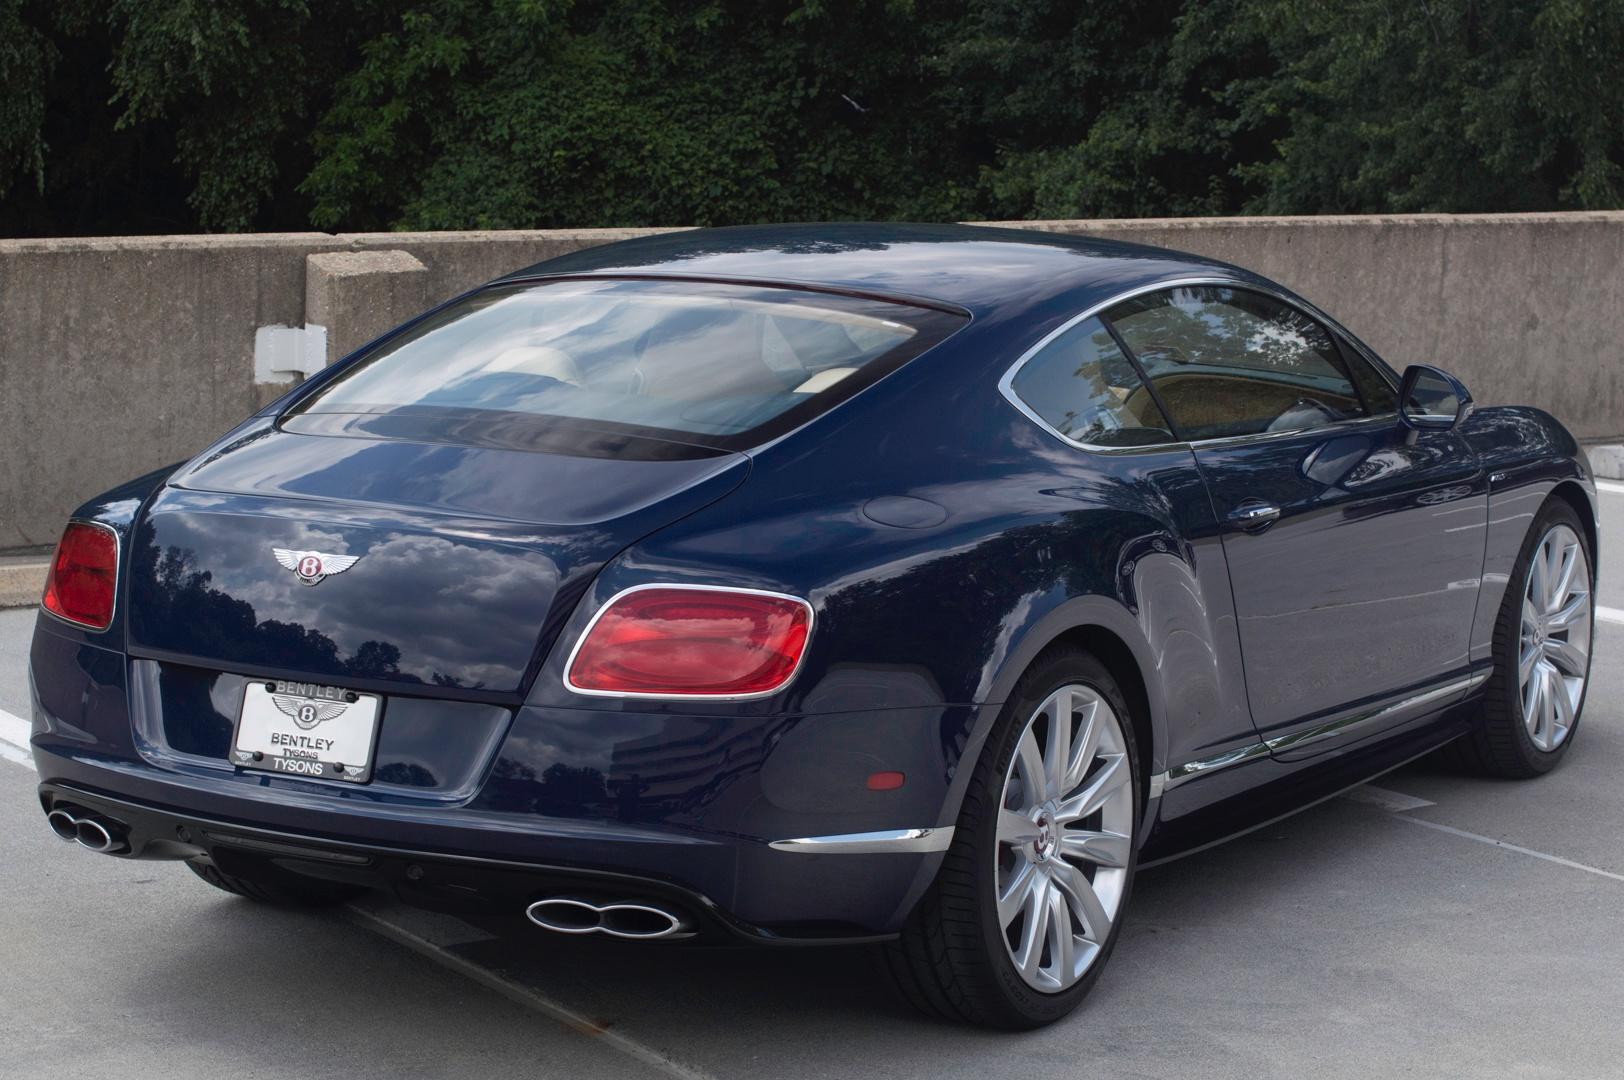 2014 Bentley Continental Gt V8 S Stock 4nc096190 For Sale Near Vienna Va Va Bentley Dealer